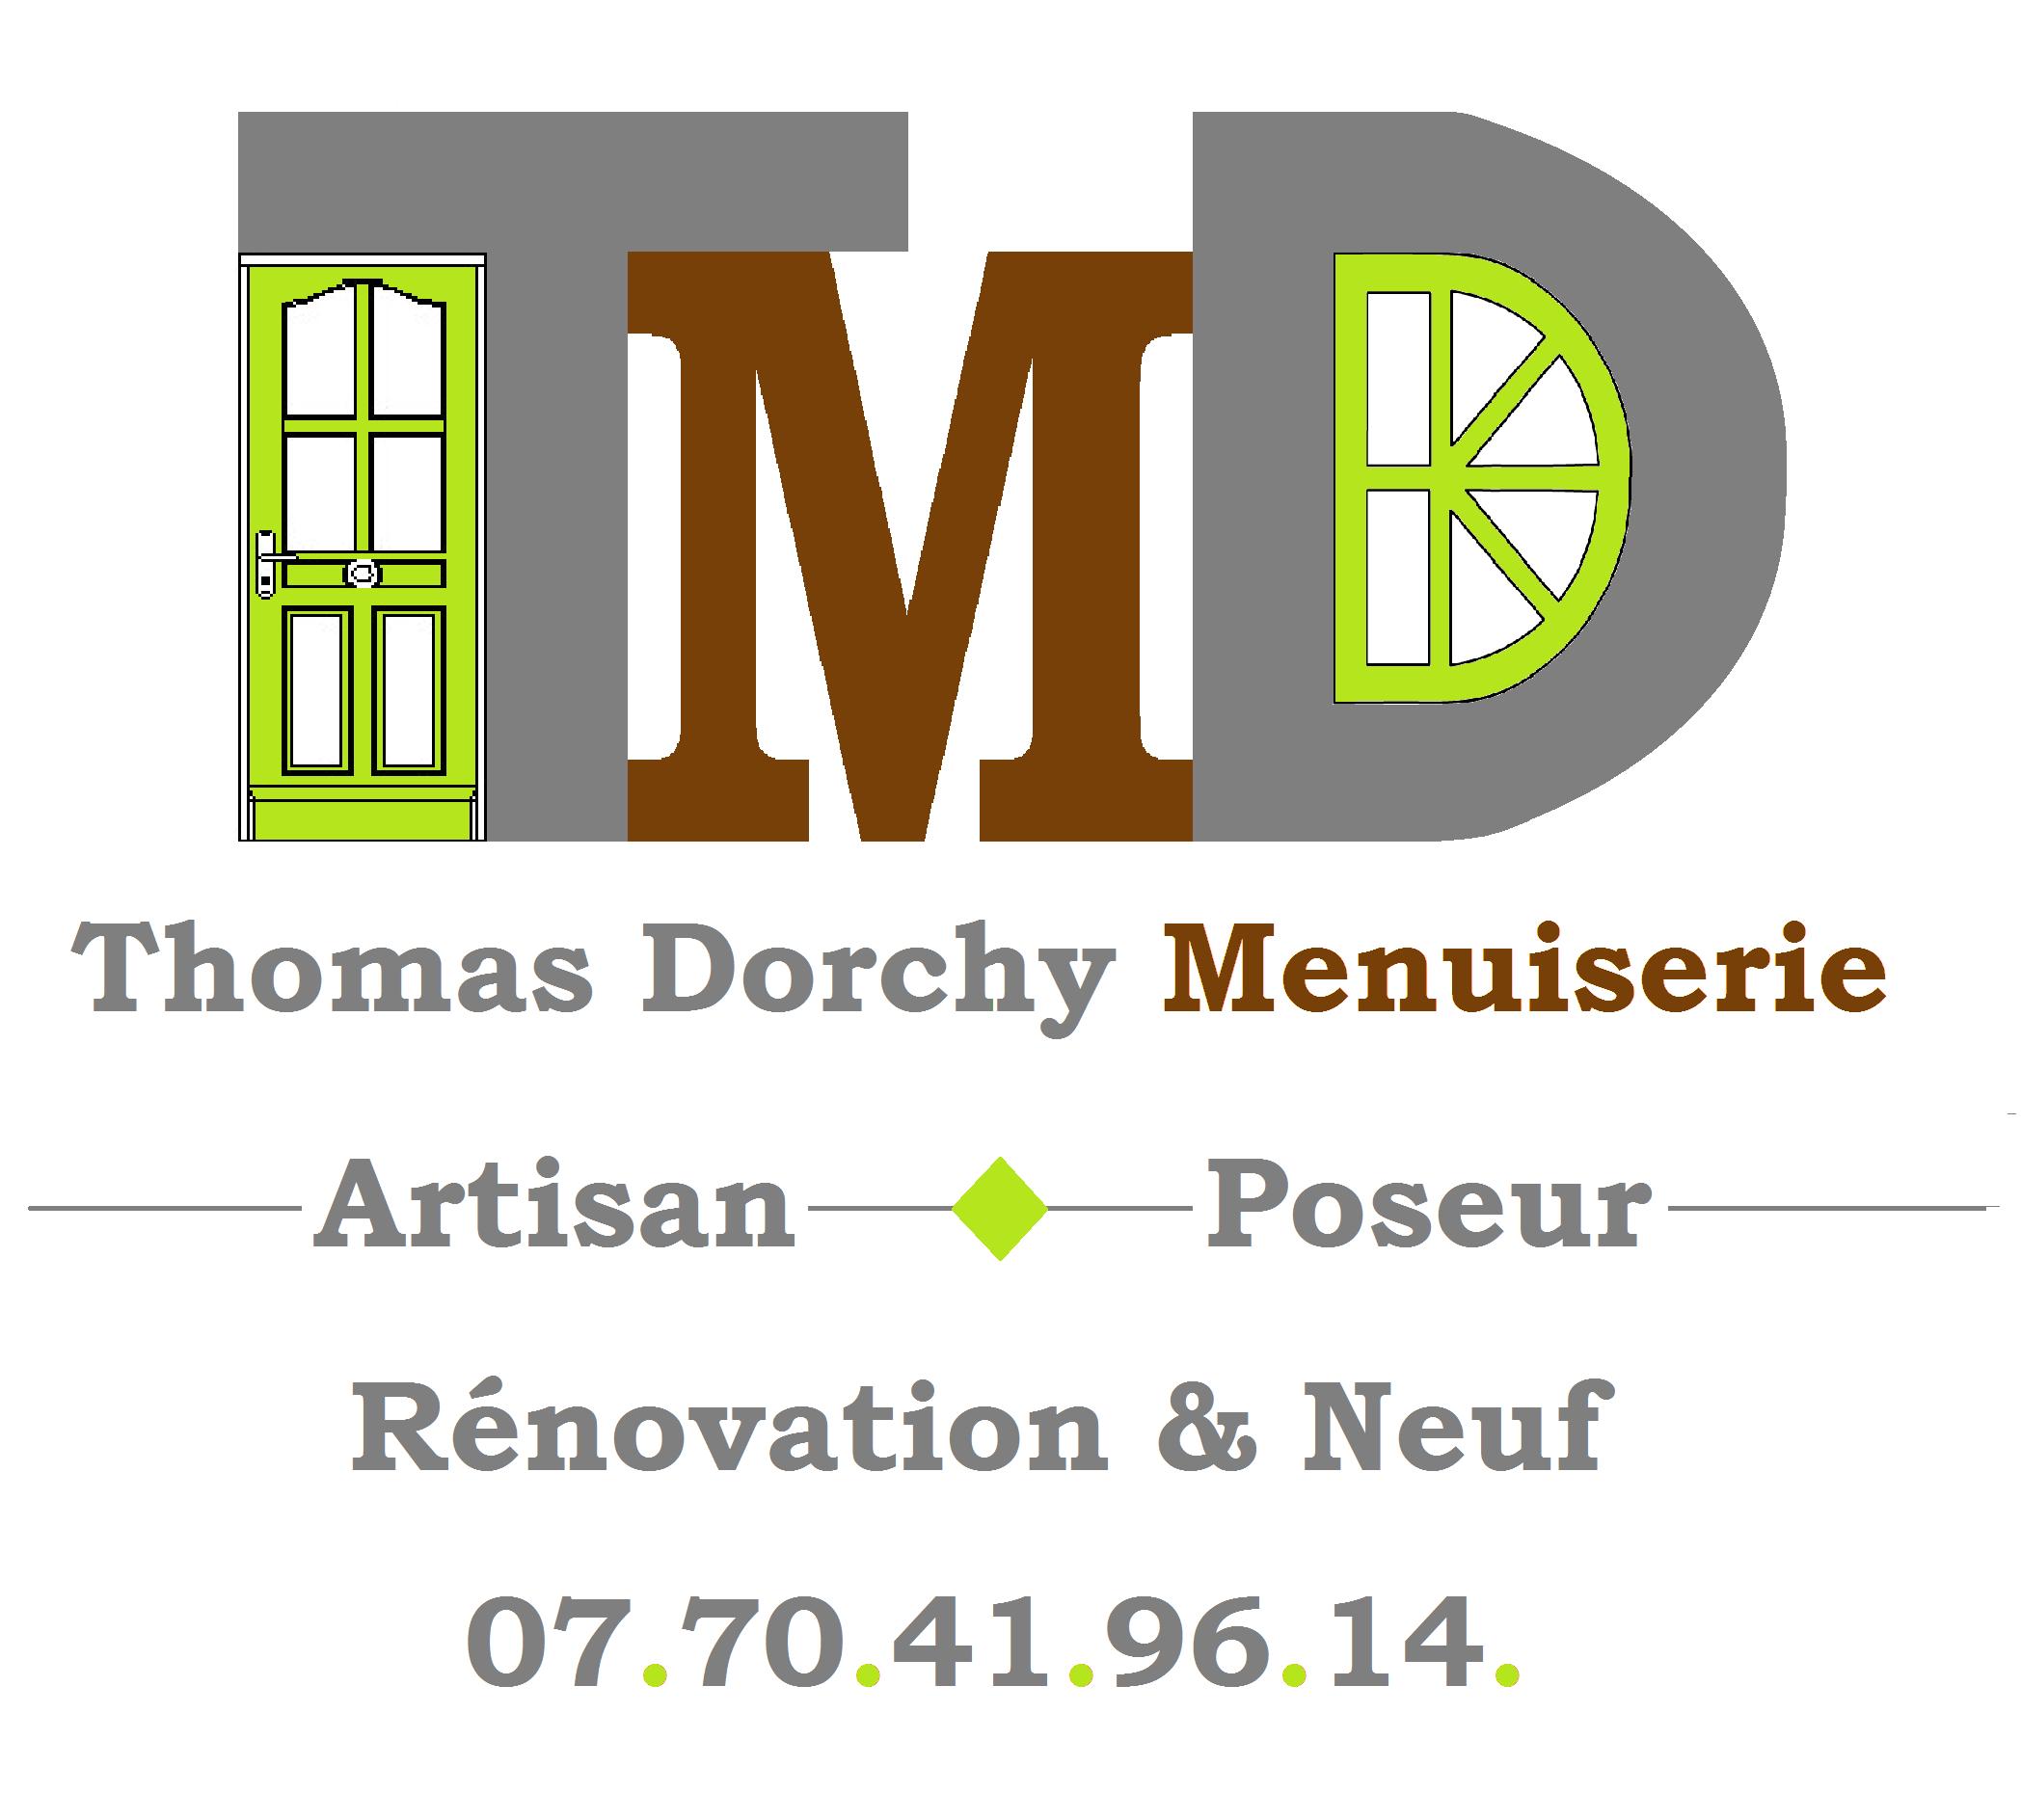 TMD thomas Dorchy Menuiserie